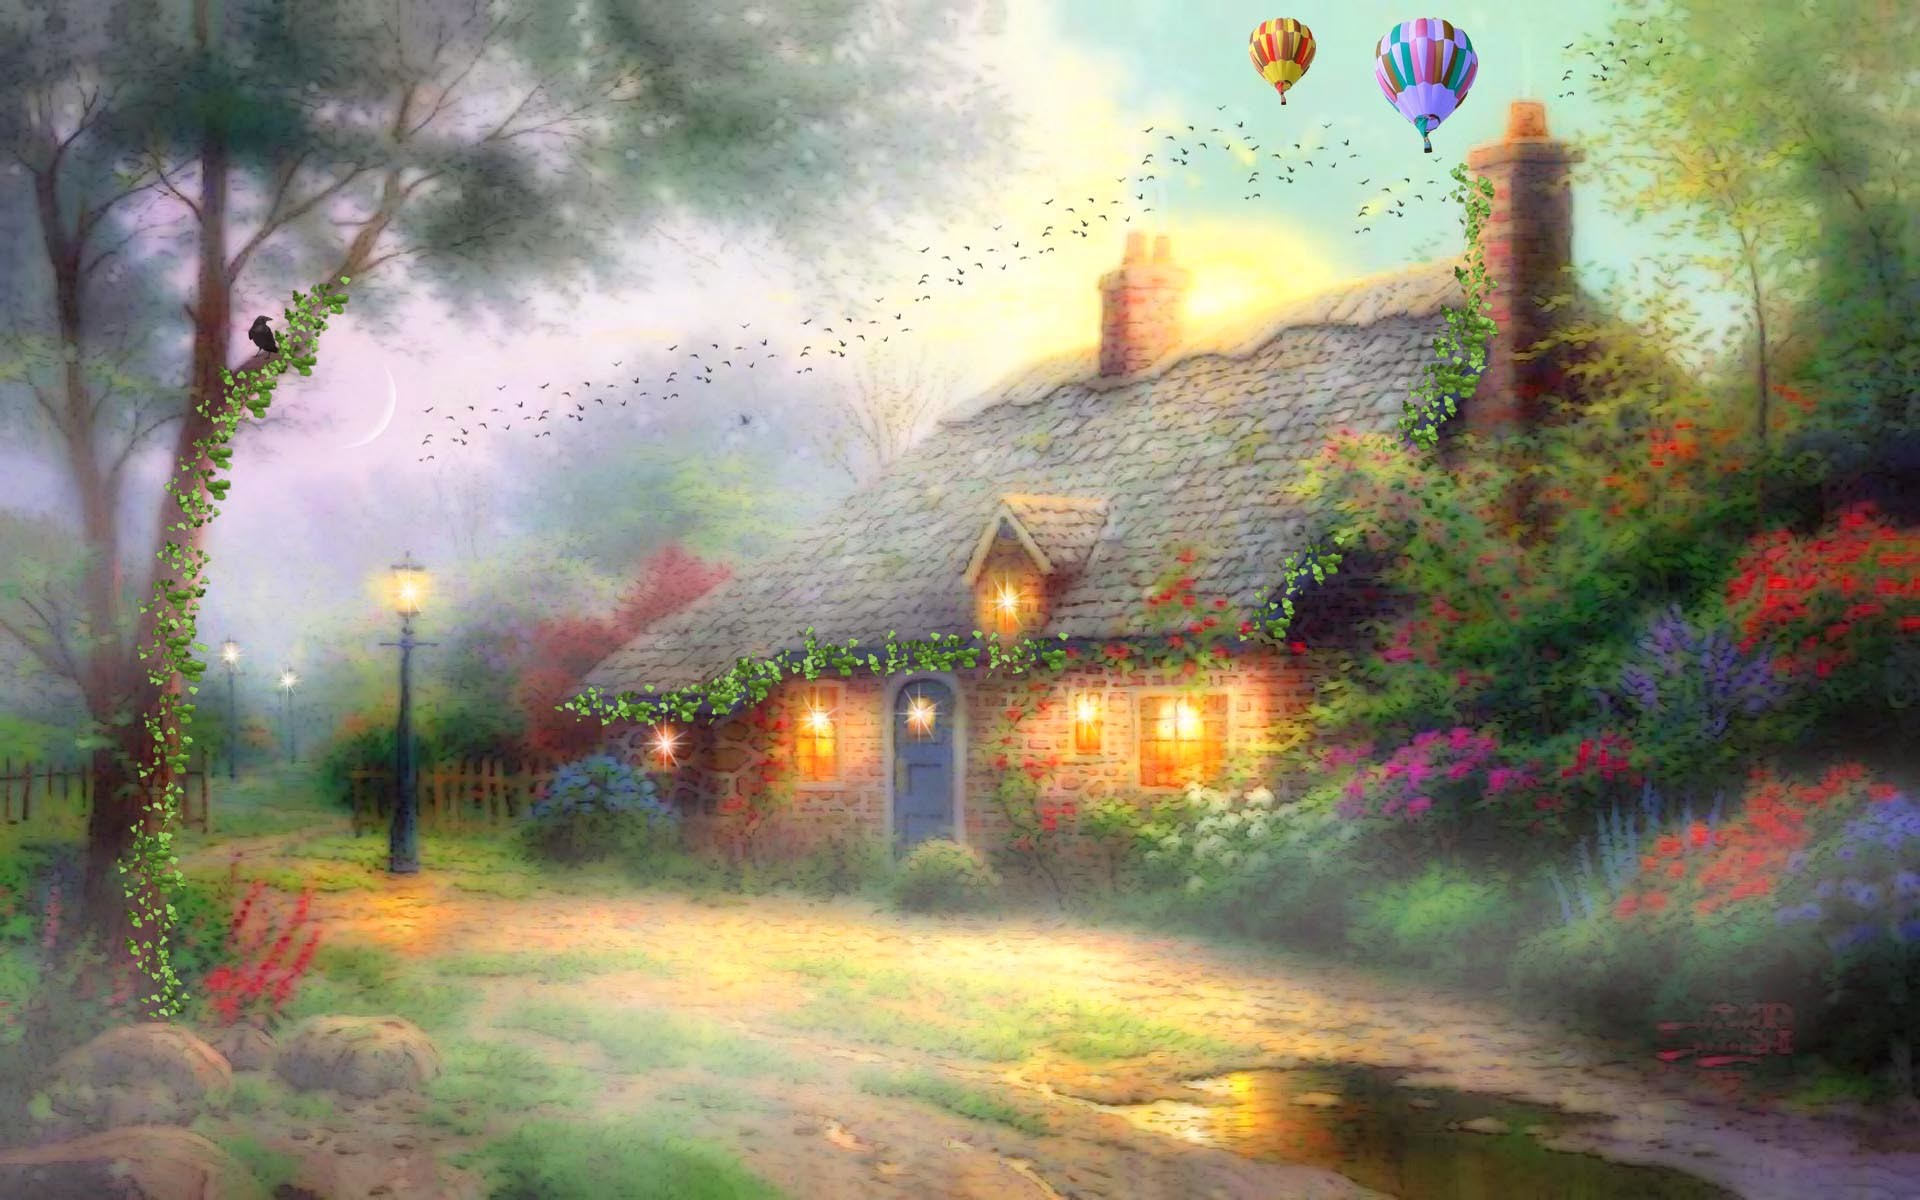 Fairy village / 1920 x 1200 / Fantasy / Photography | MIRIADNA.COM